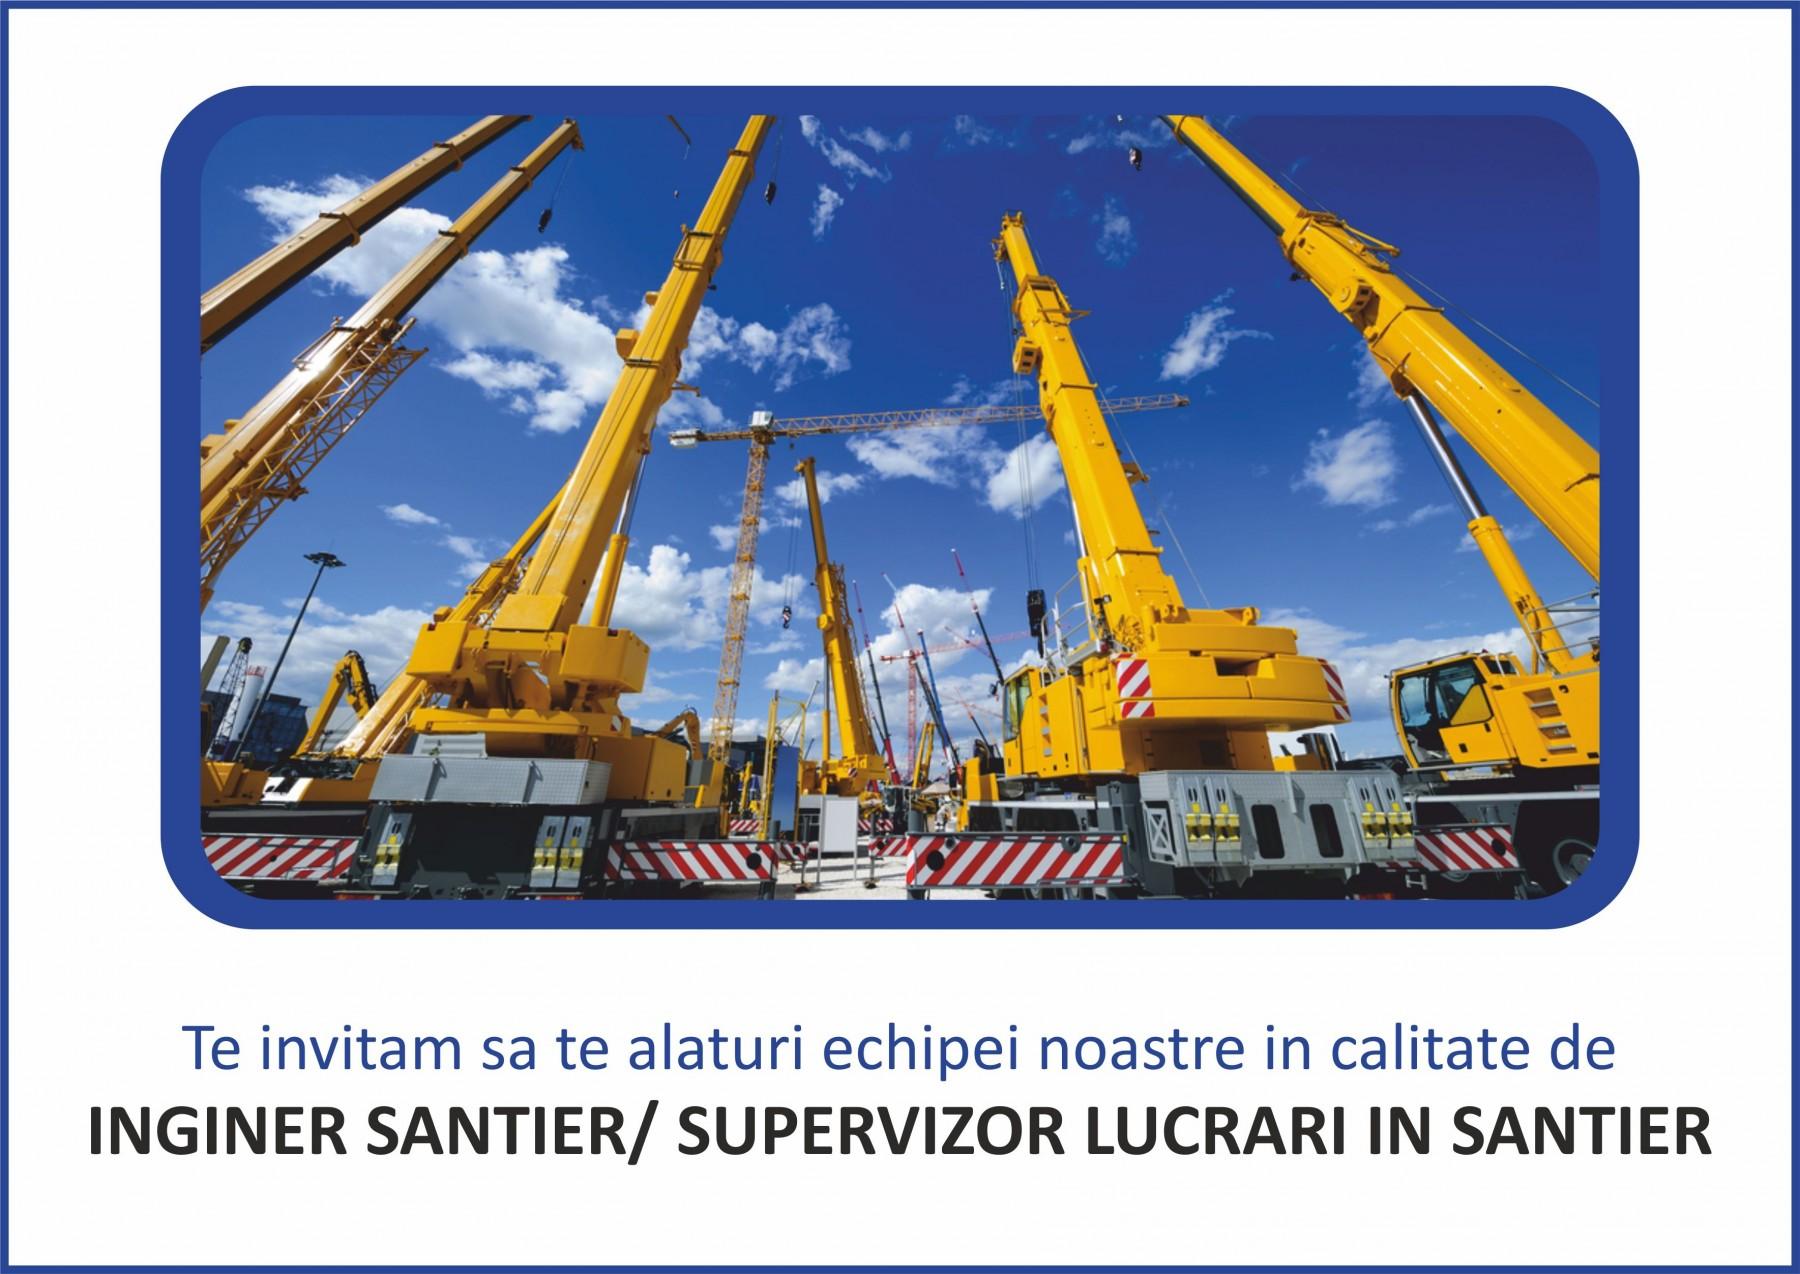 Inginer santier/ Supervizor lucrari in santier